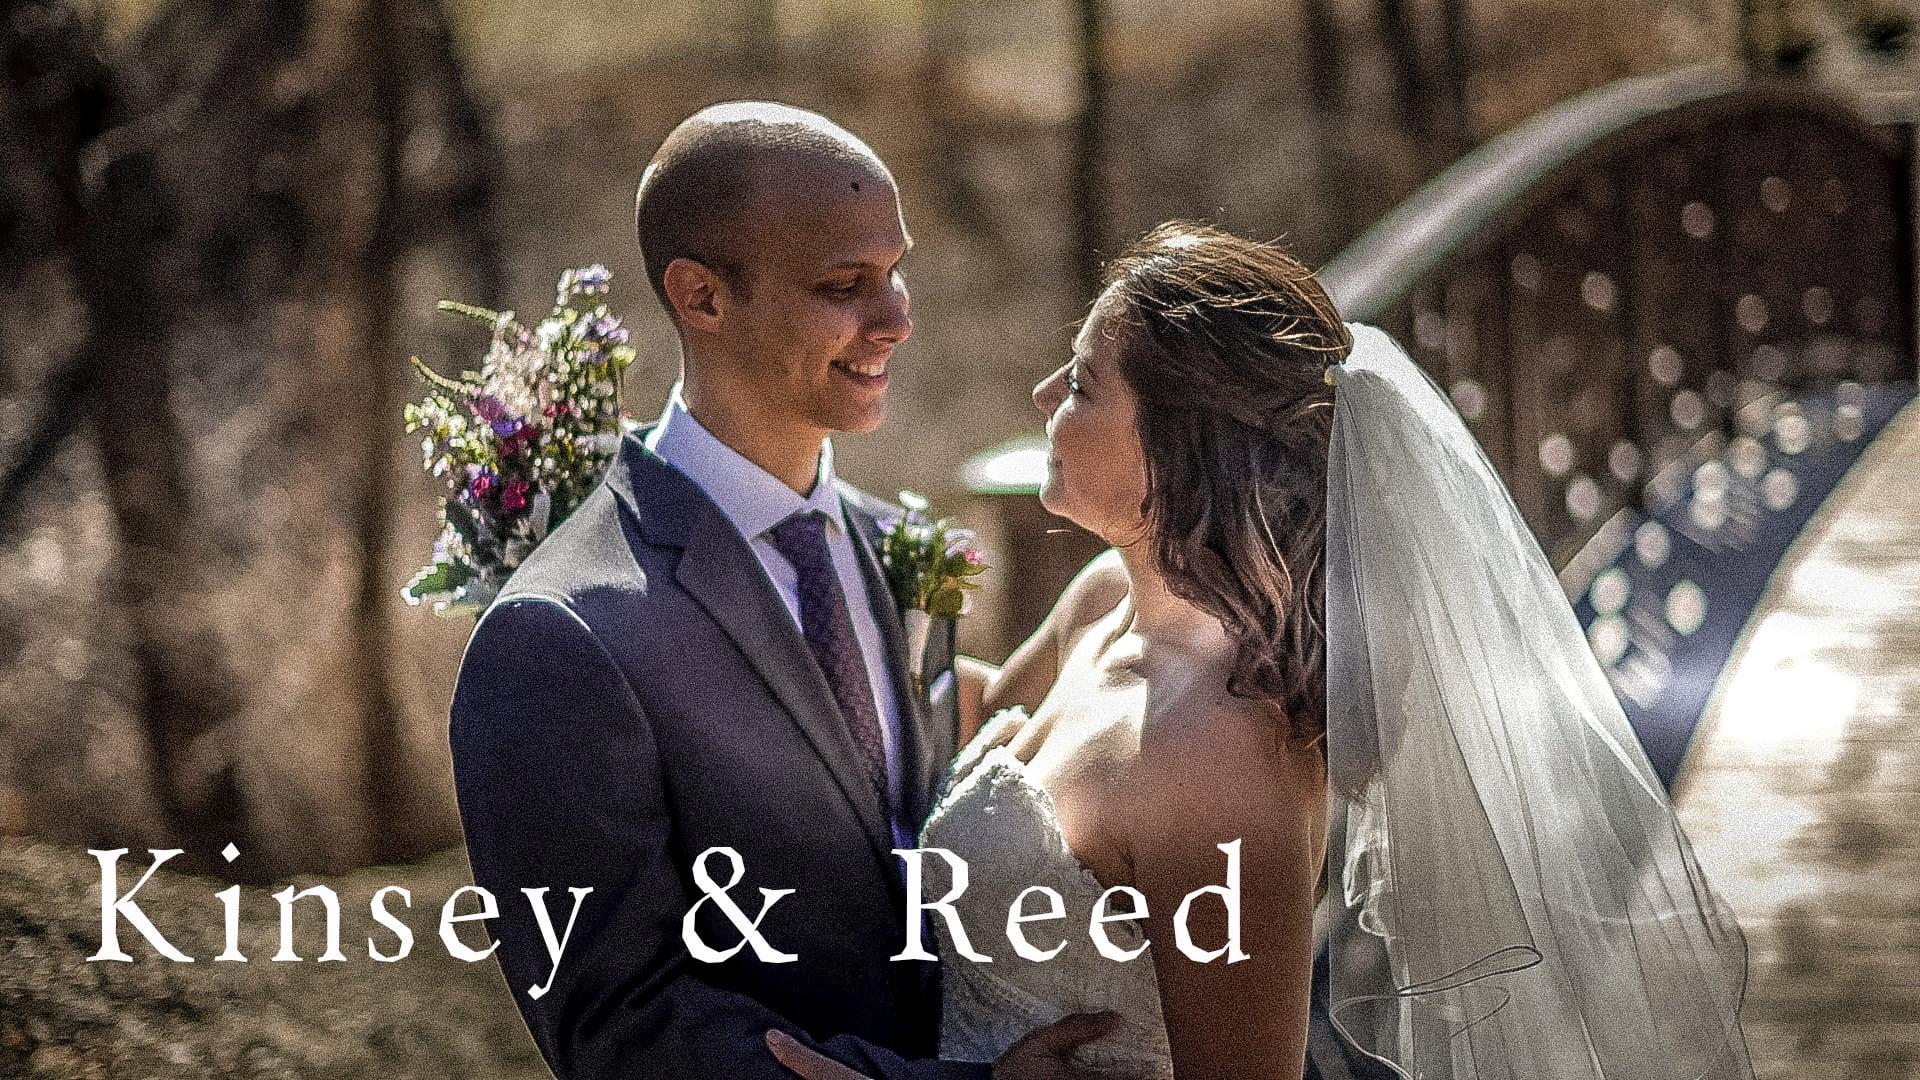 Kinsey & Reed Wedding Film